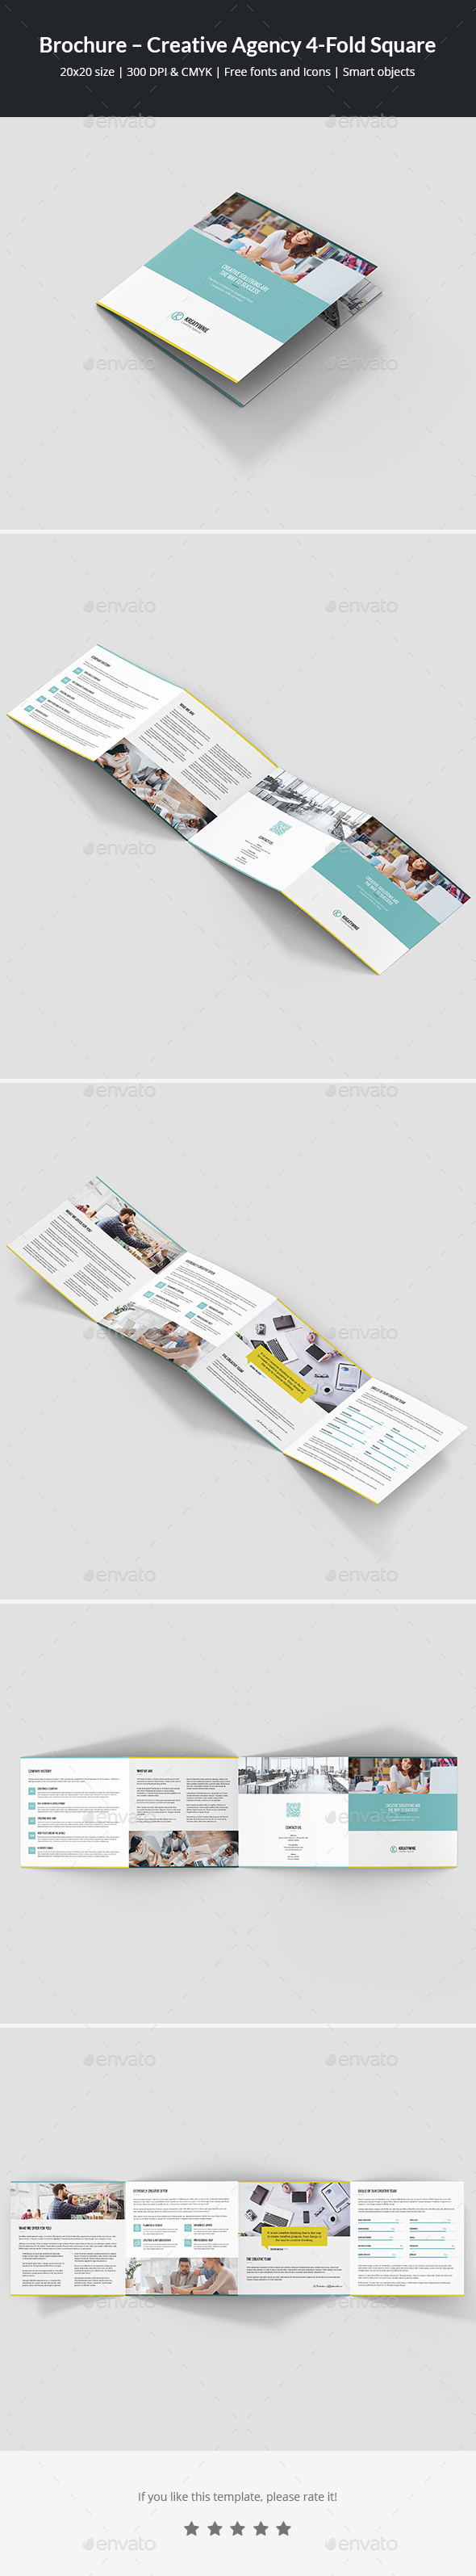 Brochure – Creative Agency 4-Fold Square - Corporate Brochures